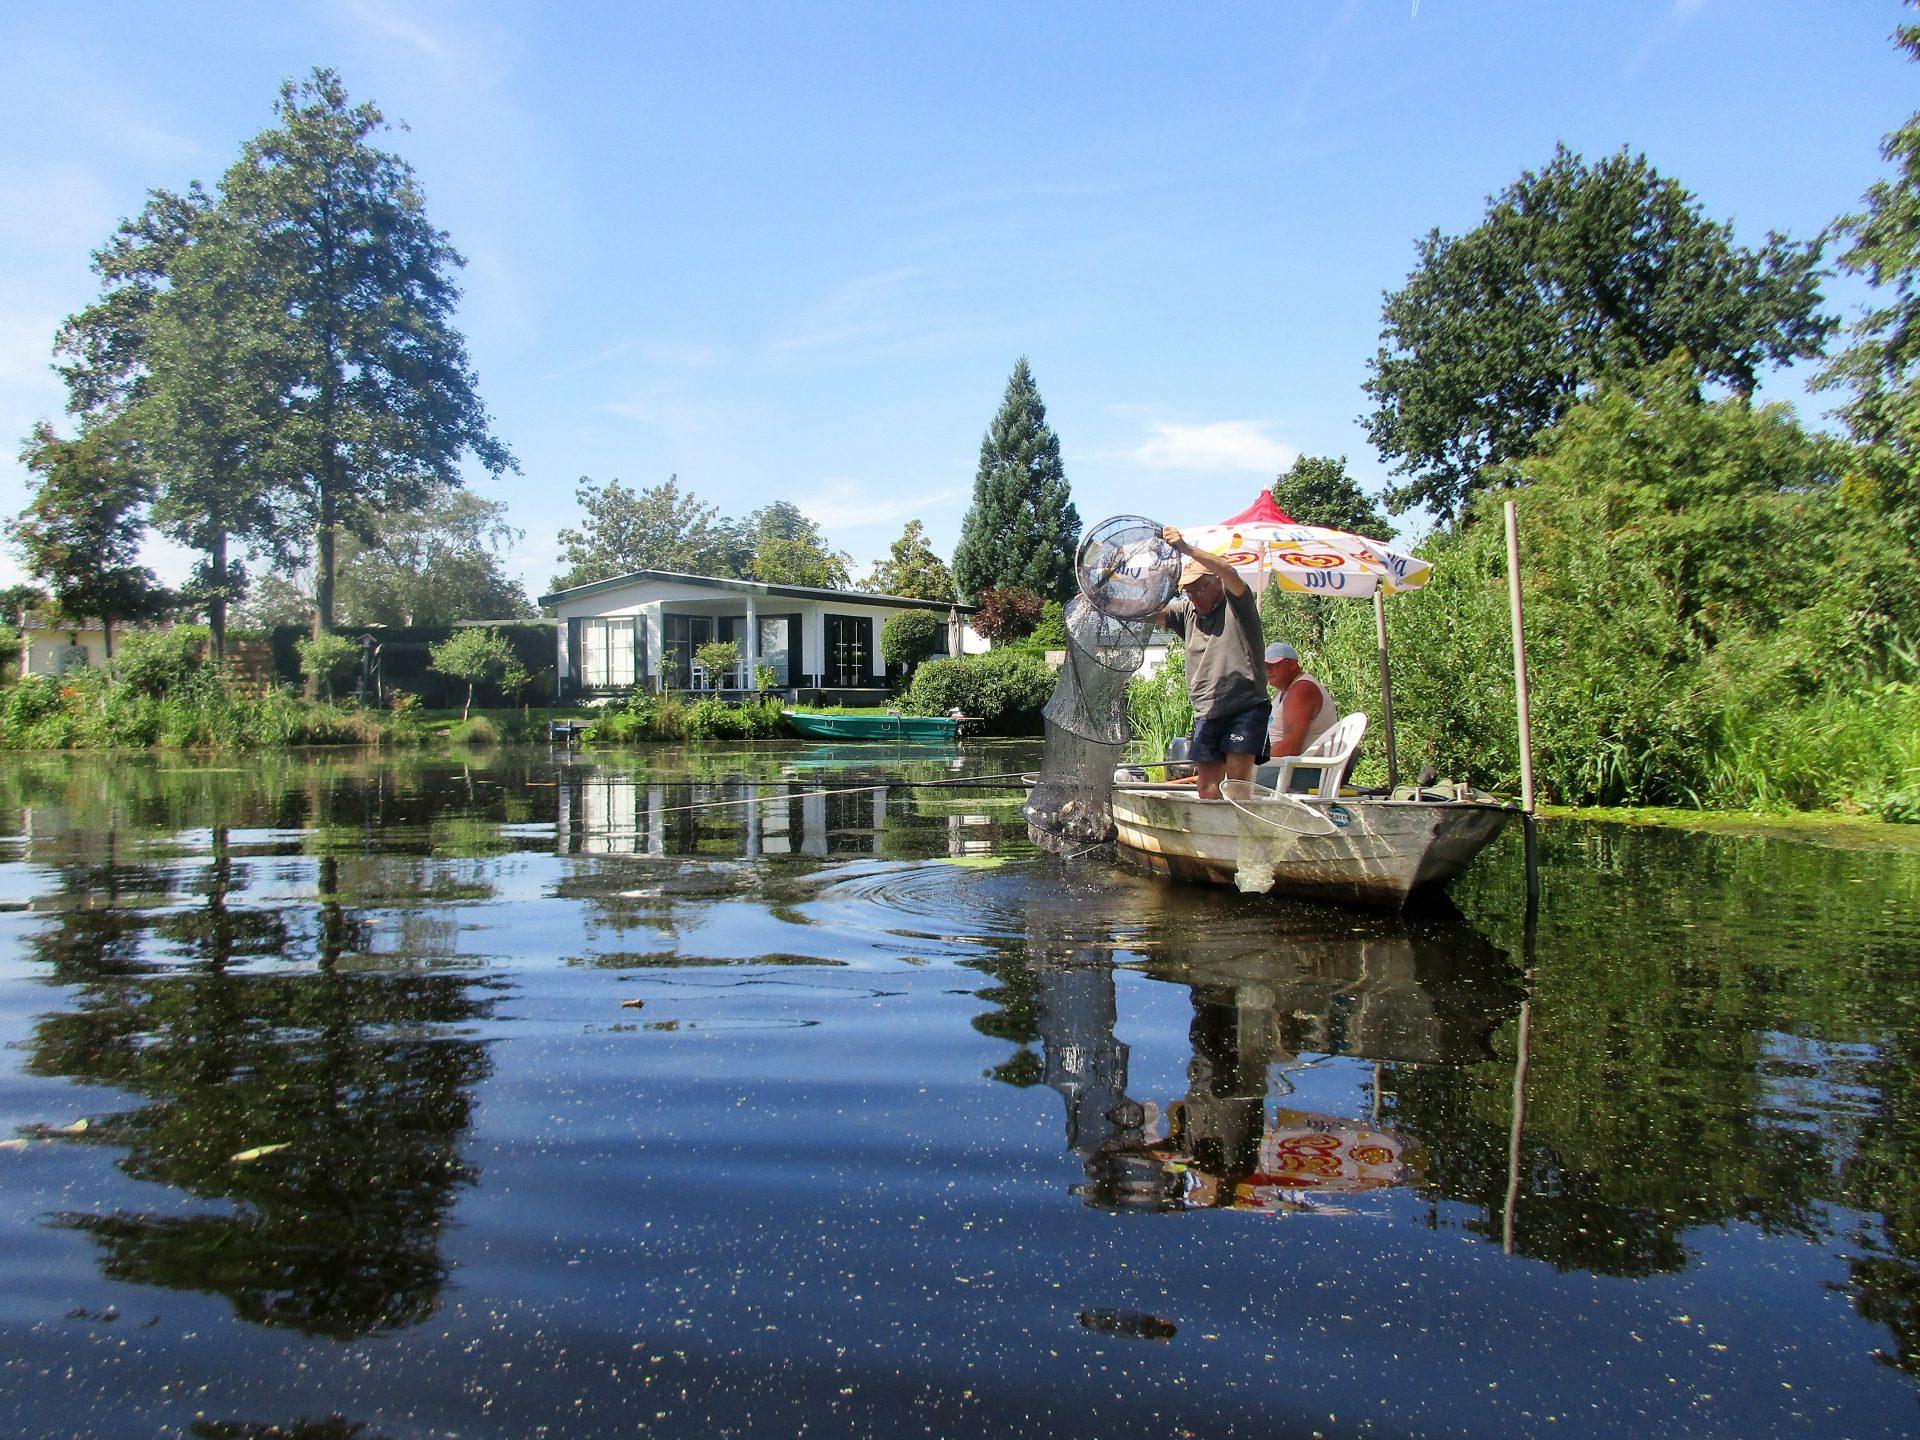 Camping aan viswater Nederland